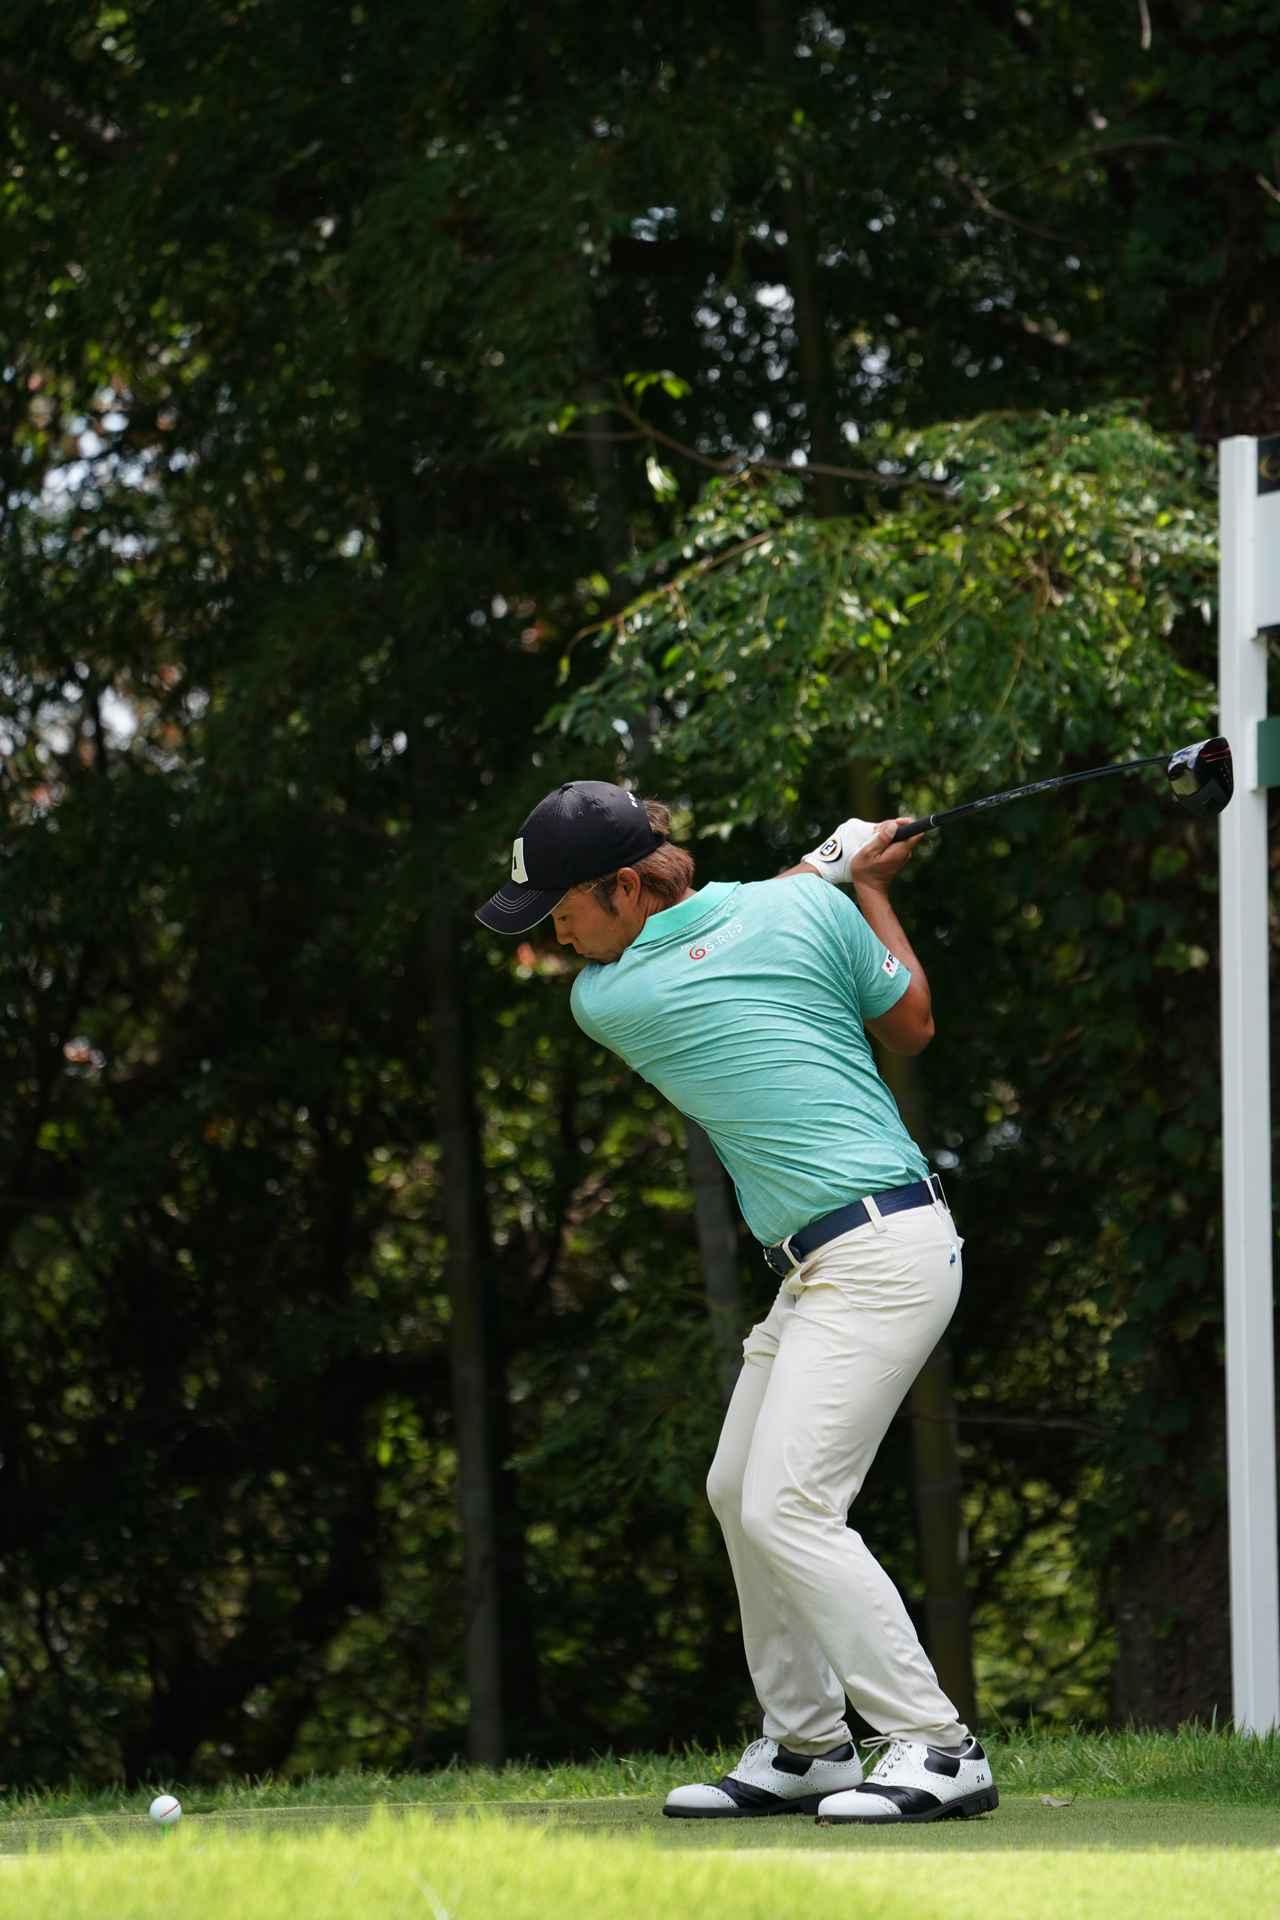 Images : 5番目の画像 - 浅地洋佑のドライバー連続写真 - みんなのゴルフダイジェスト